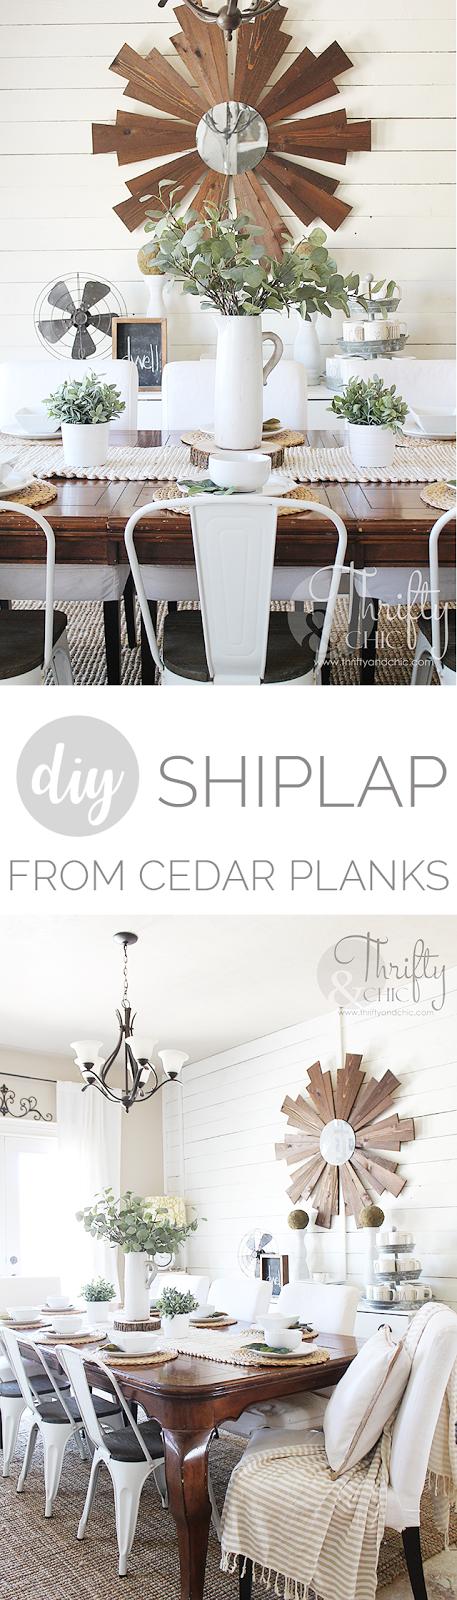 DIY shiplap wall tutorial. Shiplap made from cedar planks. Dining room farmhouse decor and decorating ideas. Fixer upper style dining room